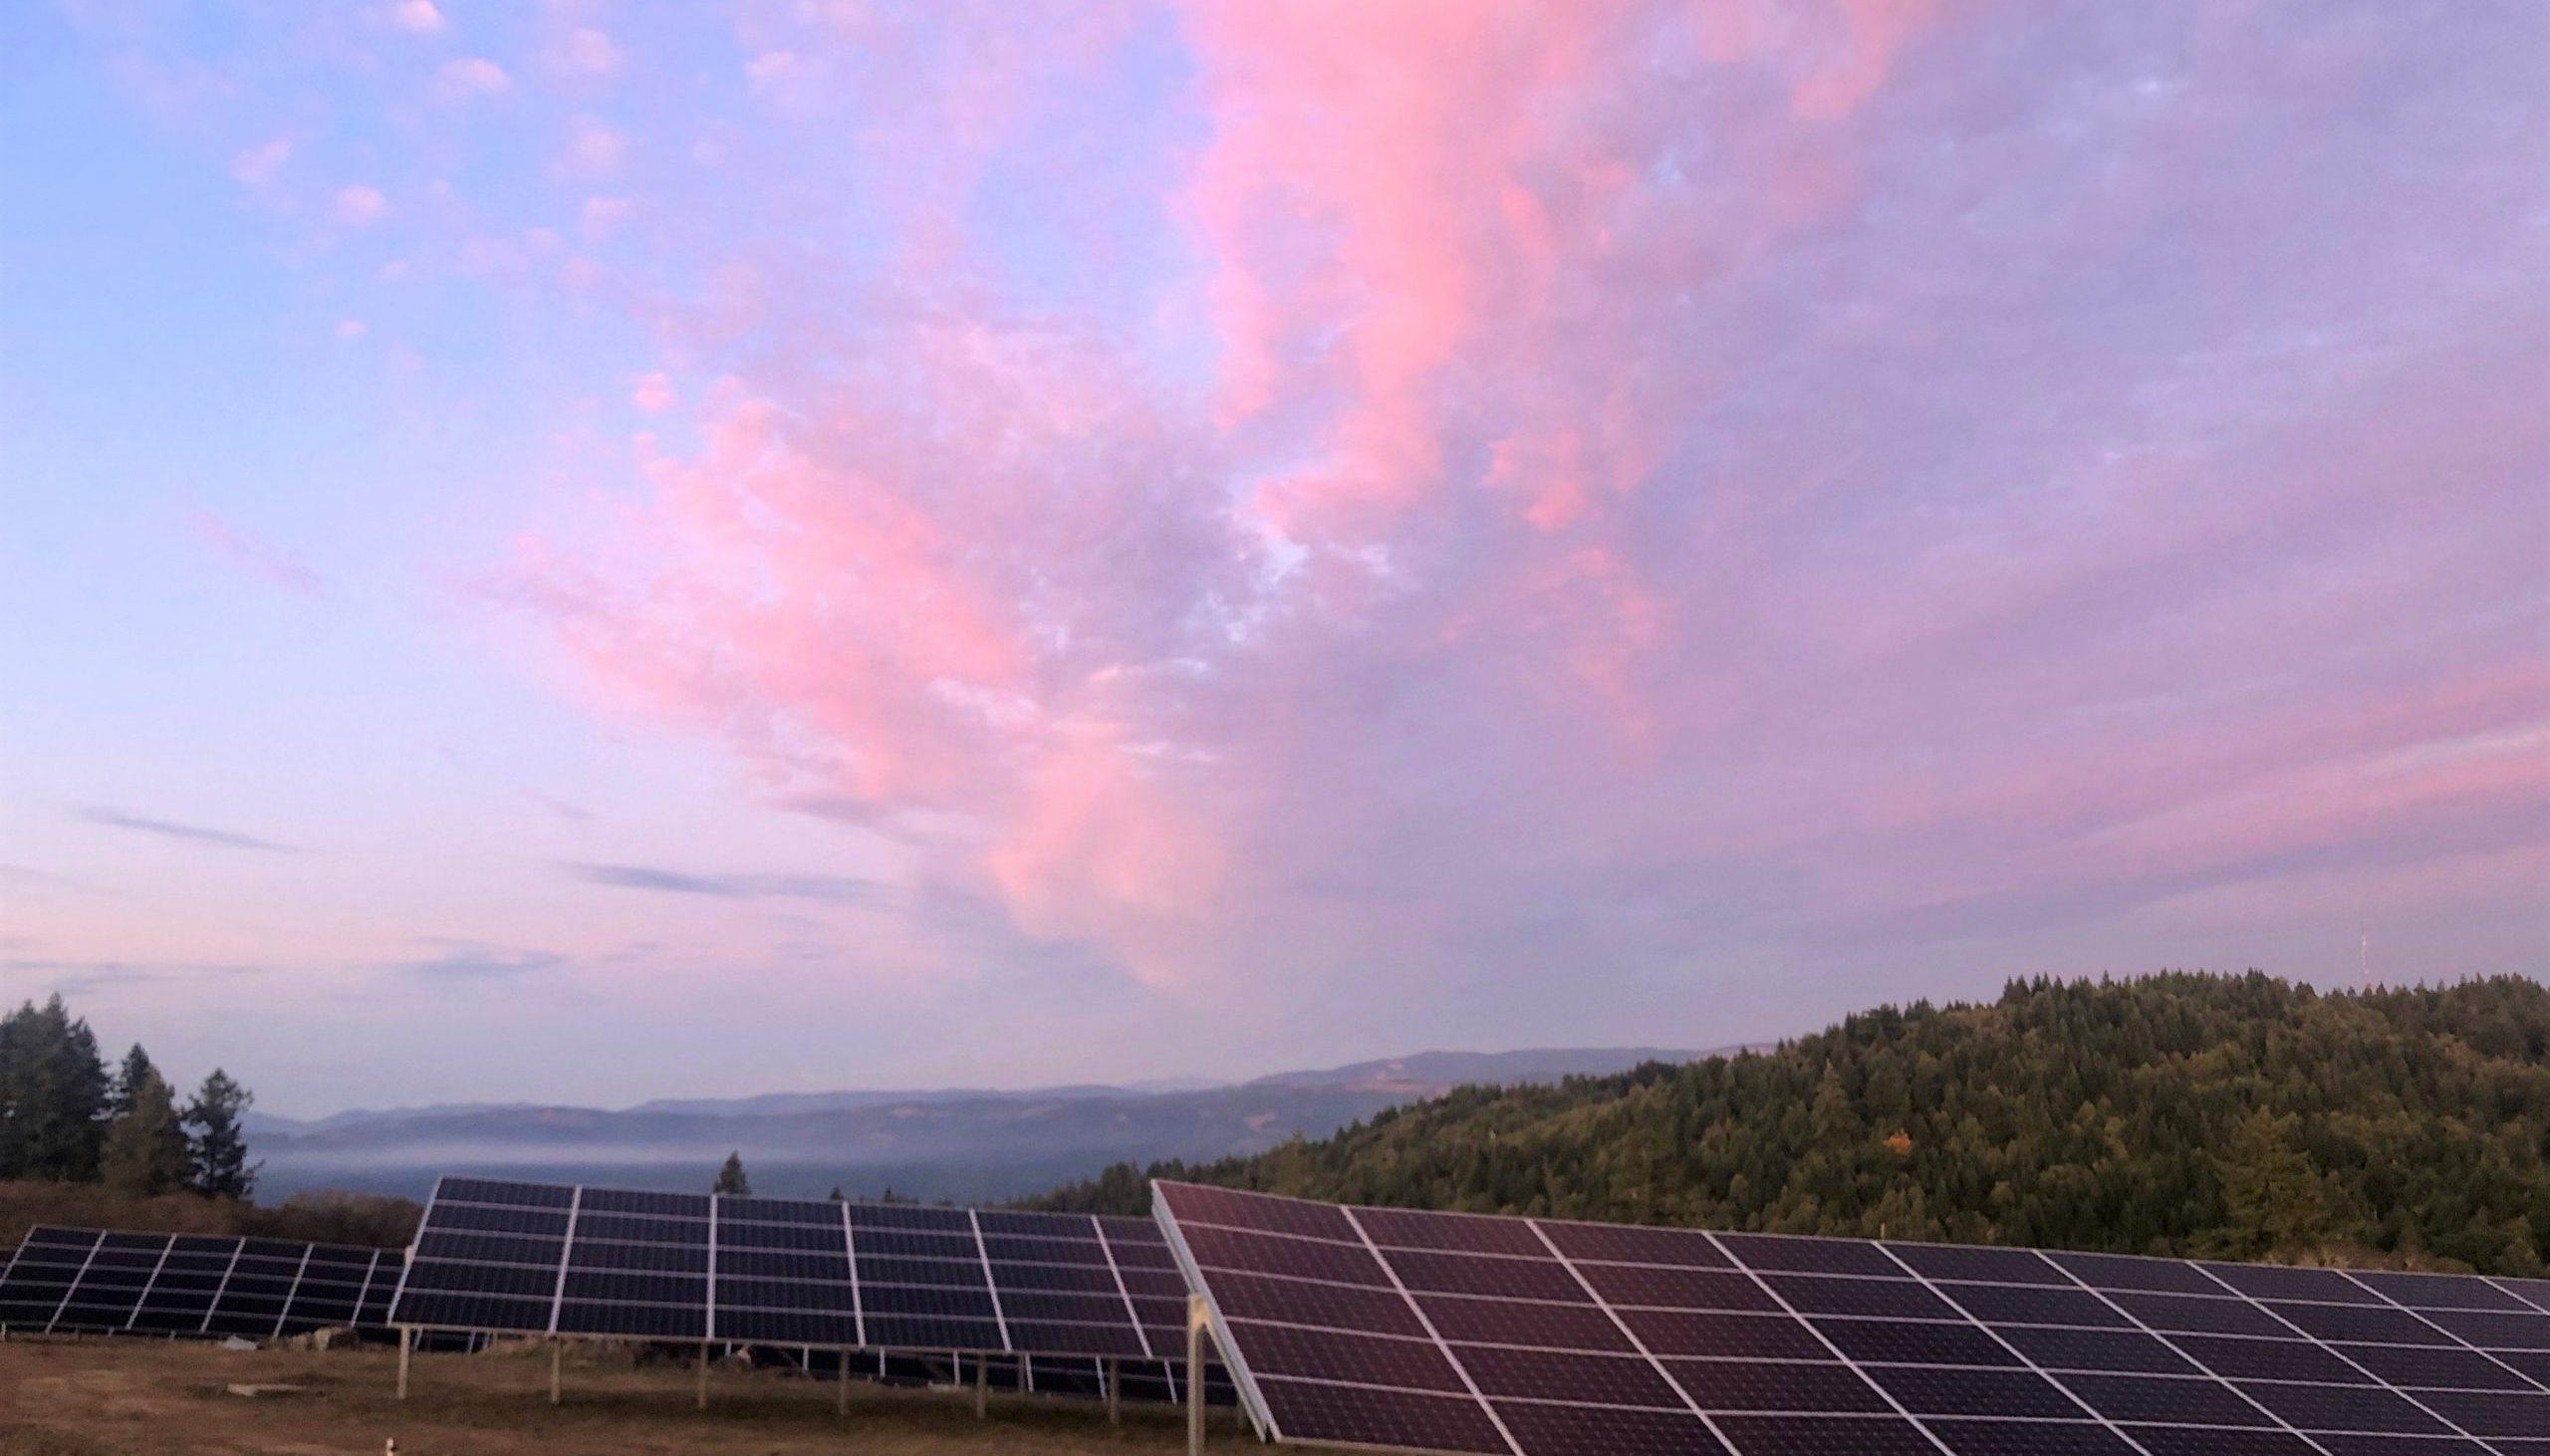 KEET solar panels in Kneeland at sunset